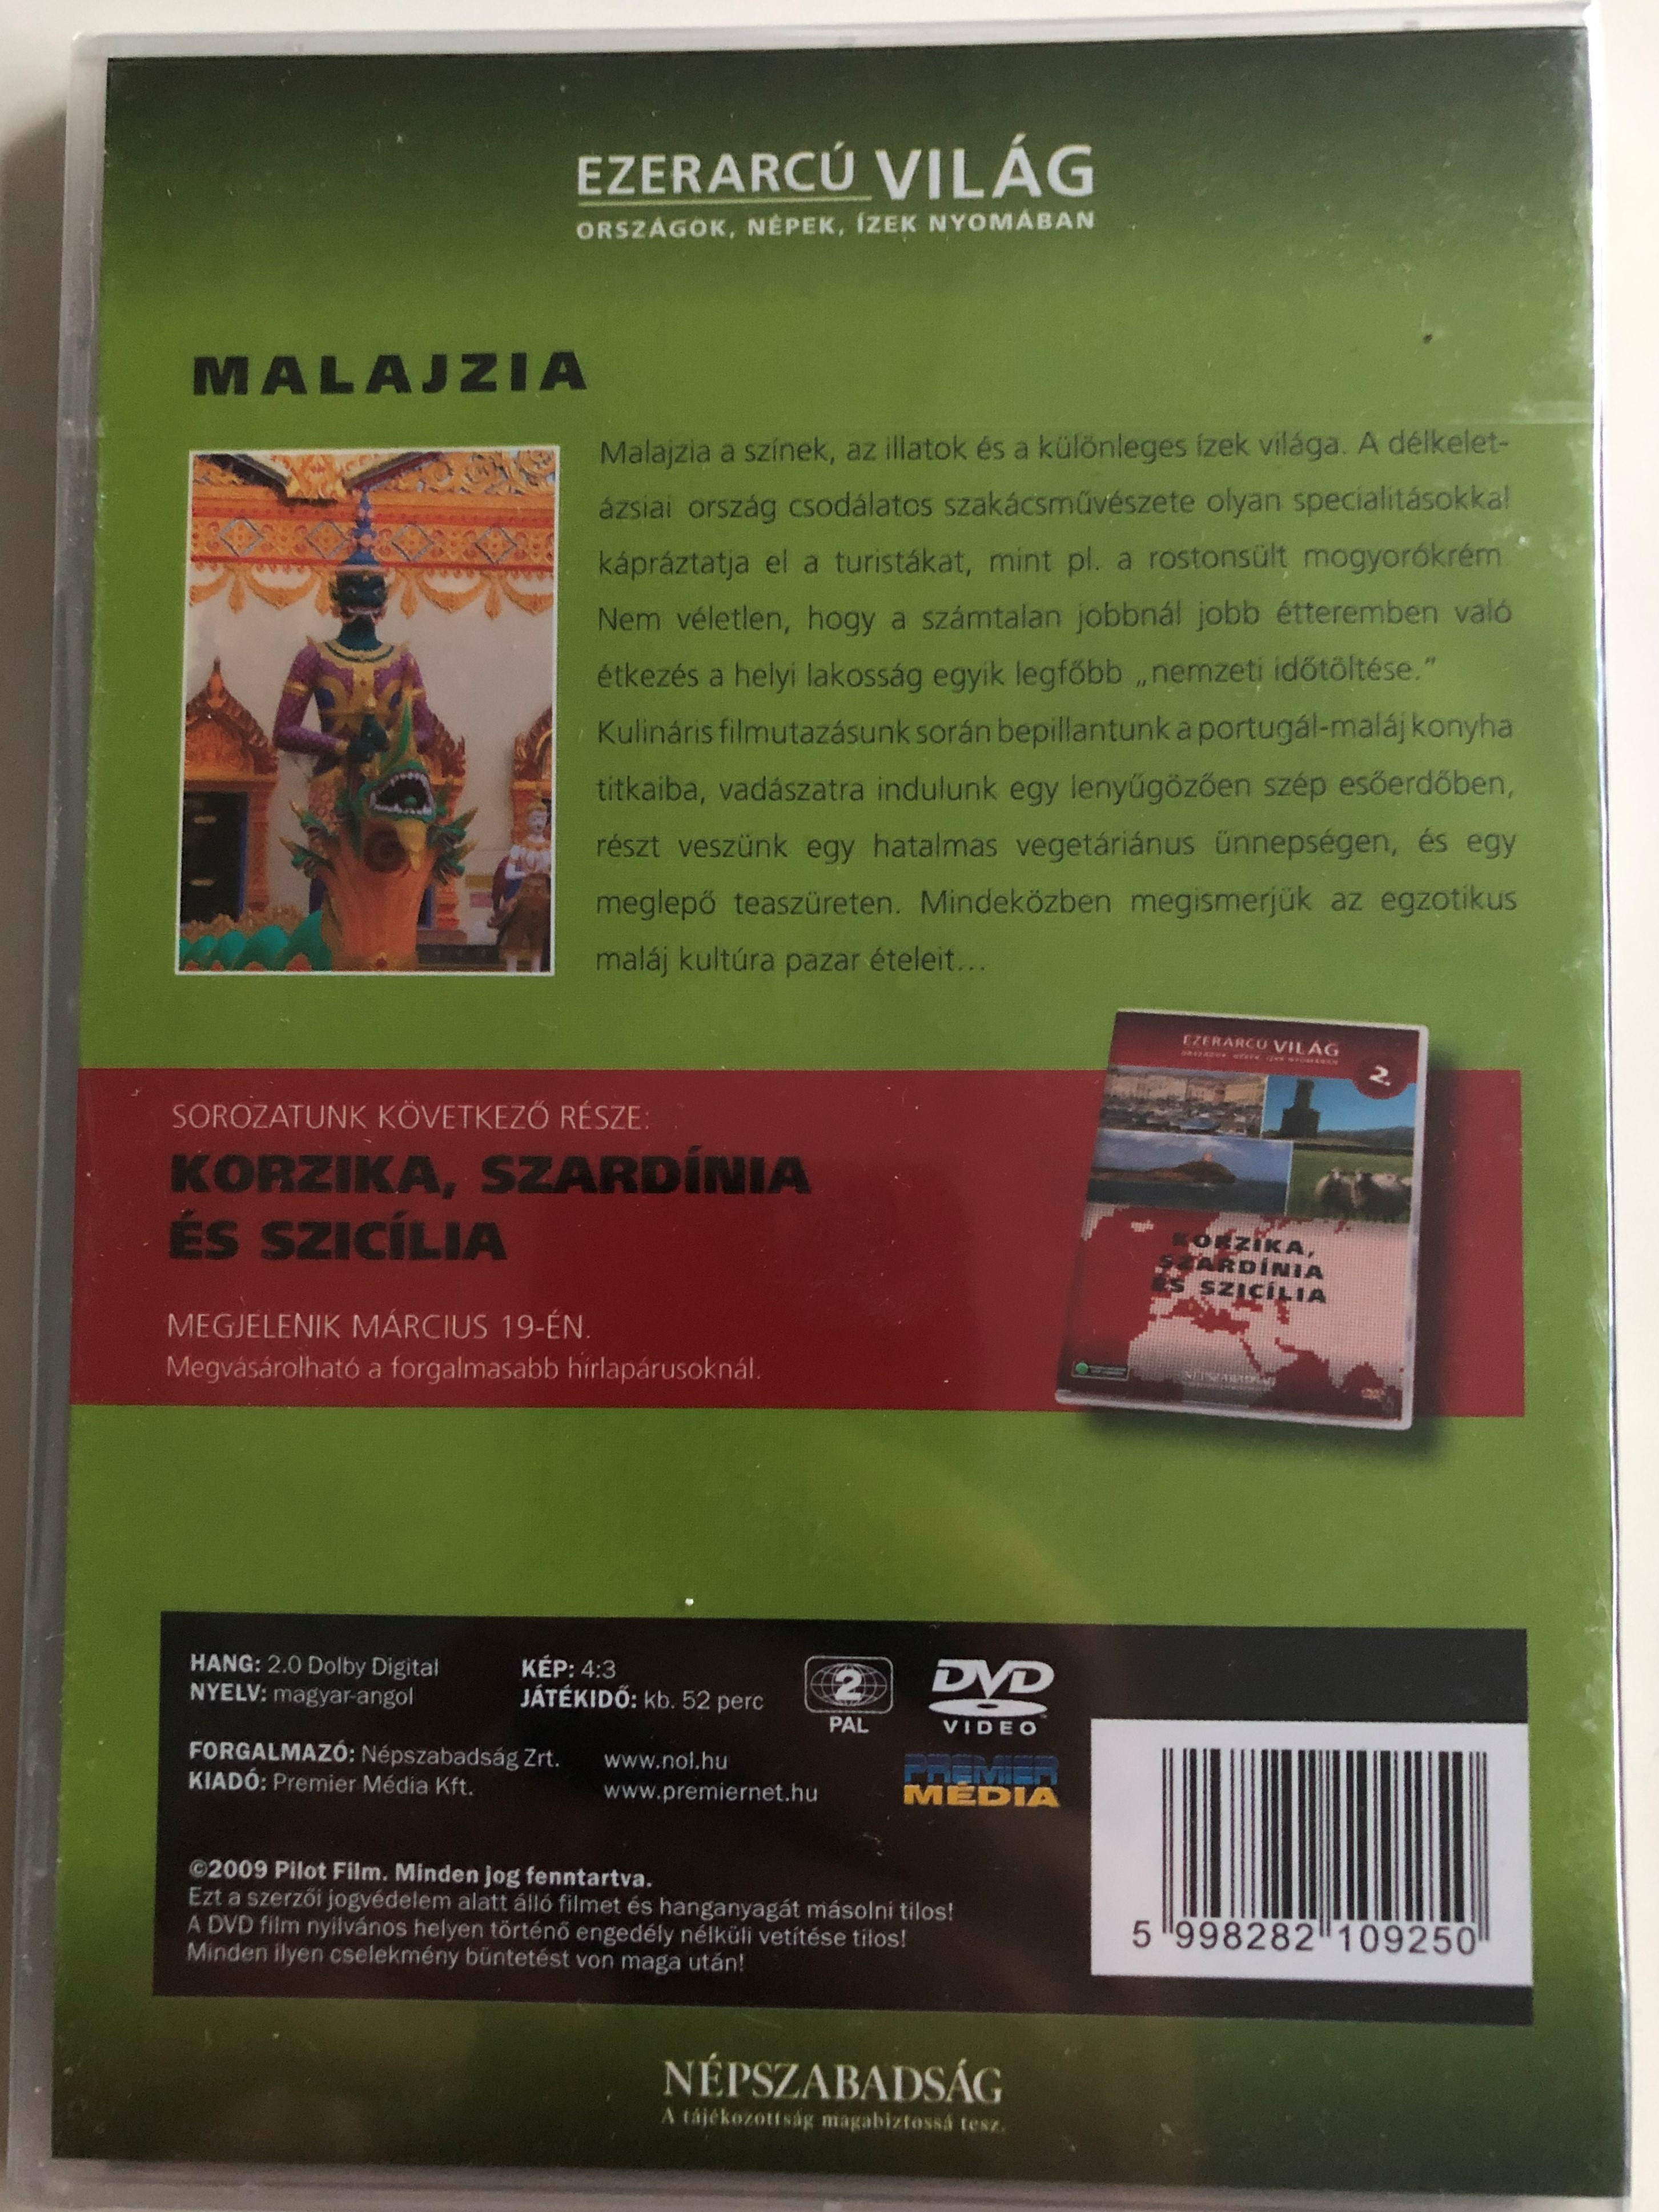 ezerarc-vil-g-vol.-1-malajzia-malaysia-dvd-2009-orsz-gok-n-pek-zek-nyom-ban-20-x-dvd-set-2009-n-pszabads-g-premier-media-pilot-film-documentary-series-about-our-world-2-.jpg